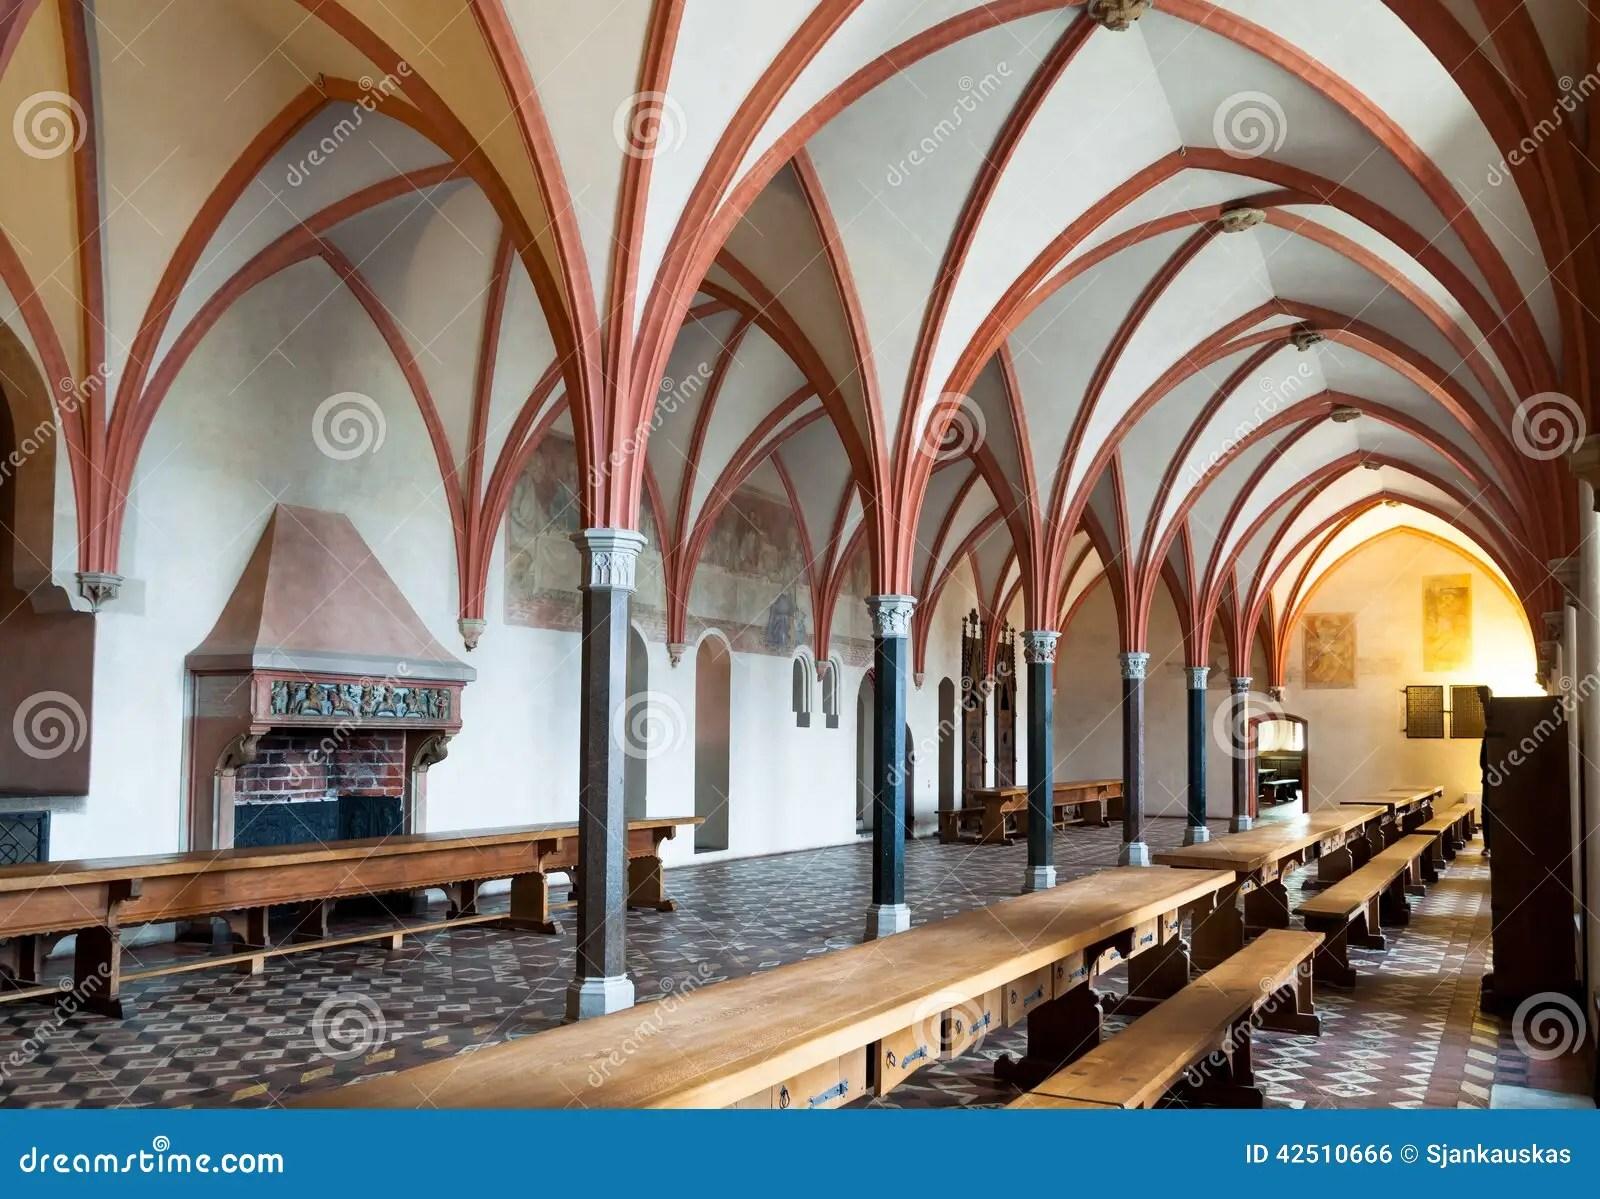 Malbork Castle Dining Hall Interior Stock Photo Image